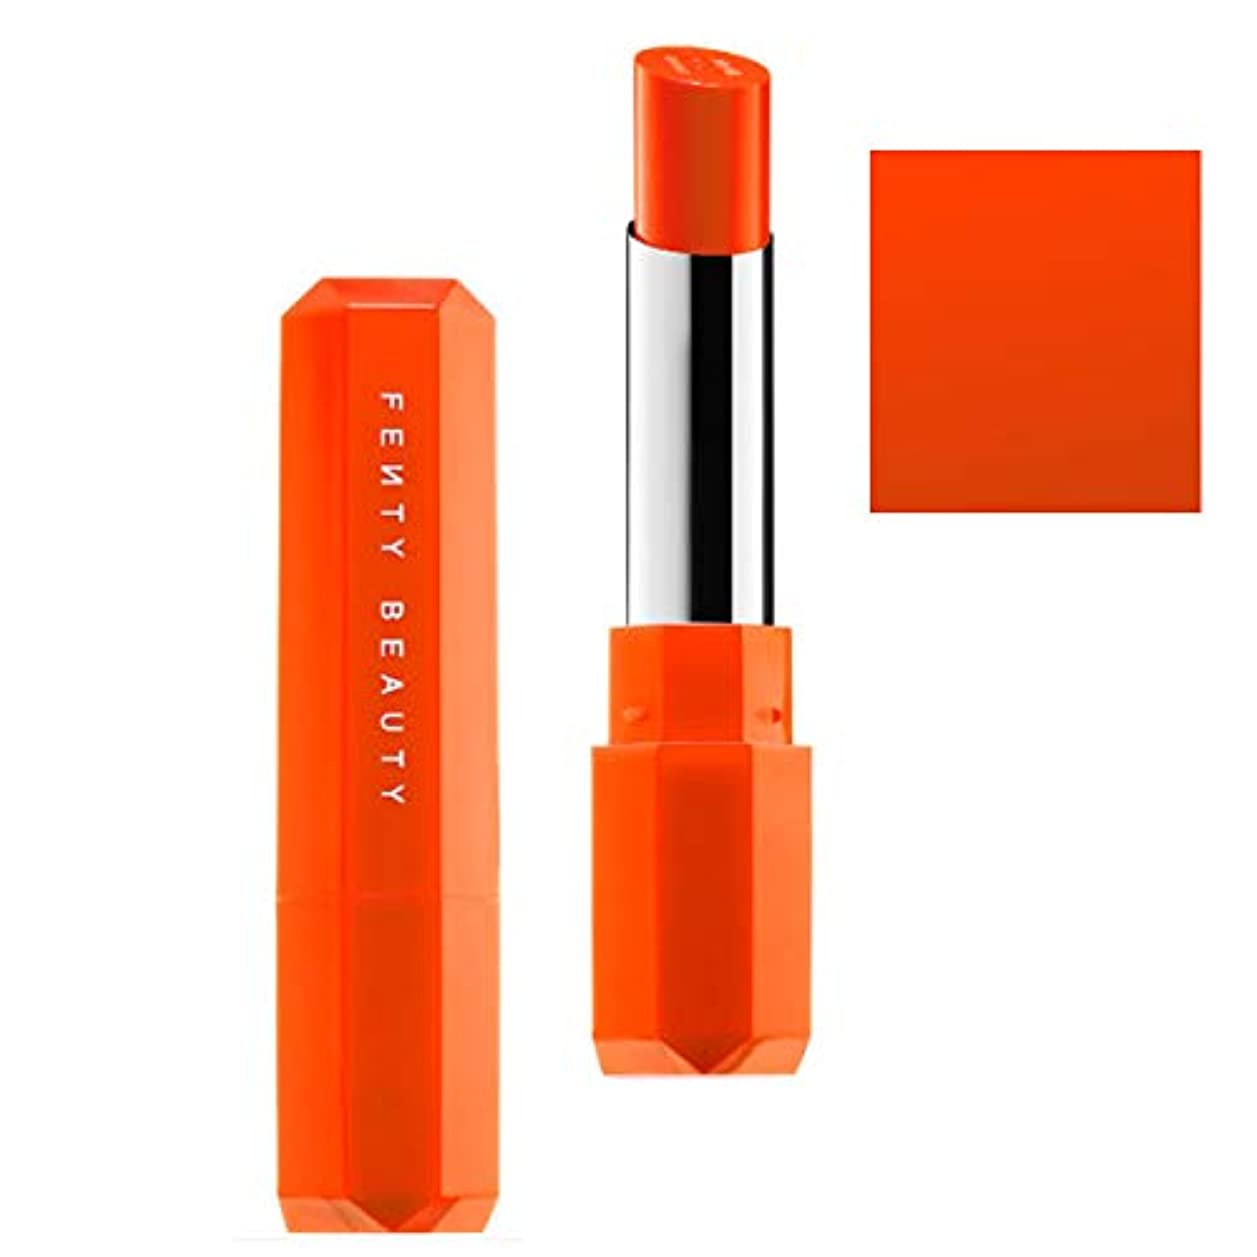 側溝起点大通りFENTY BEAUTY BY RIHANNA,New!!, 限定版 limited-edition, Poutsicle Juicy Satin Lipstick - Sun Snatched [海外直送品] [並行輸入品]